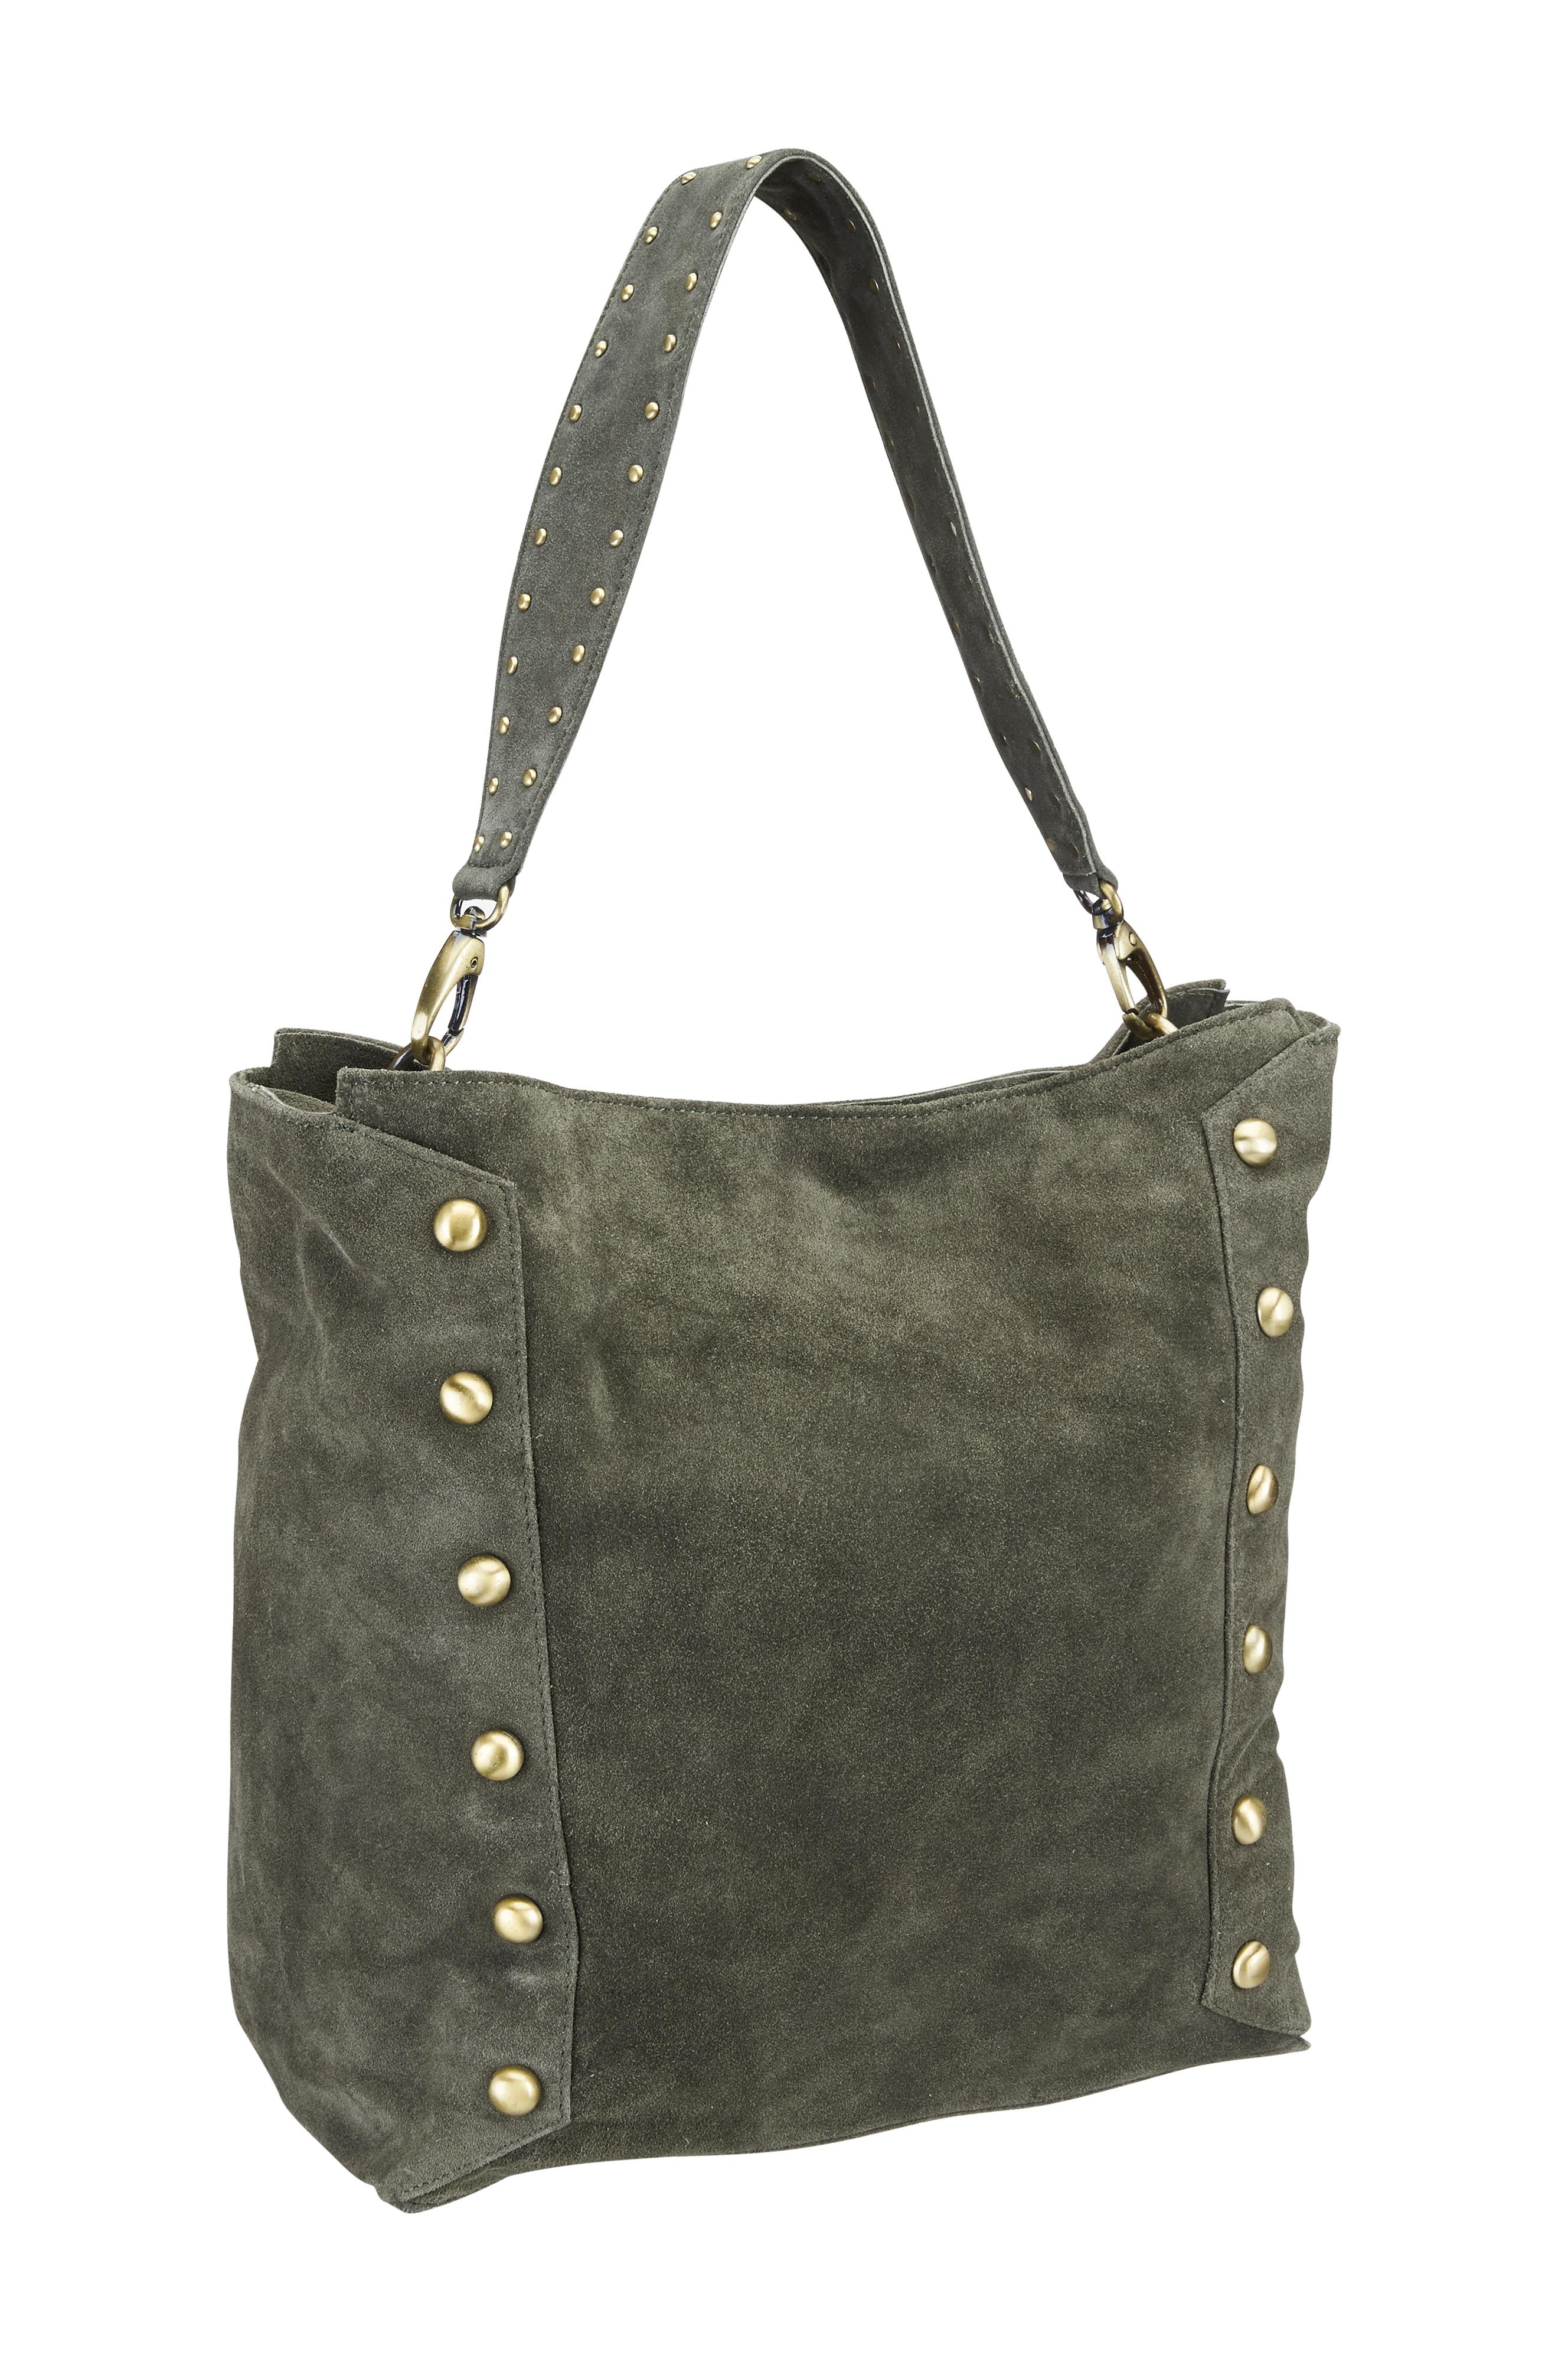 Ellos Collection Santa Fe Shopper -mokkalaukku - Vihreä - Naiset - Ellos.fi 0812f79084